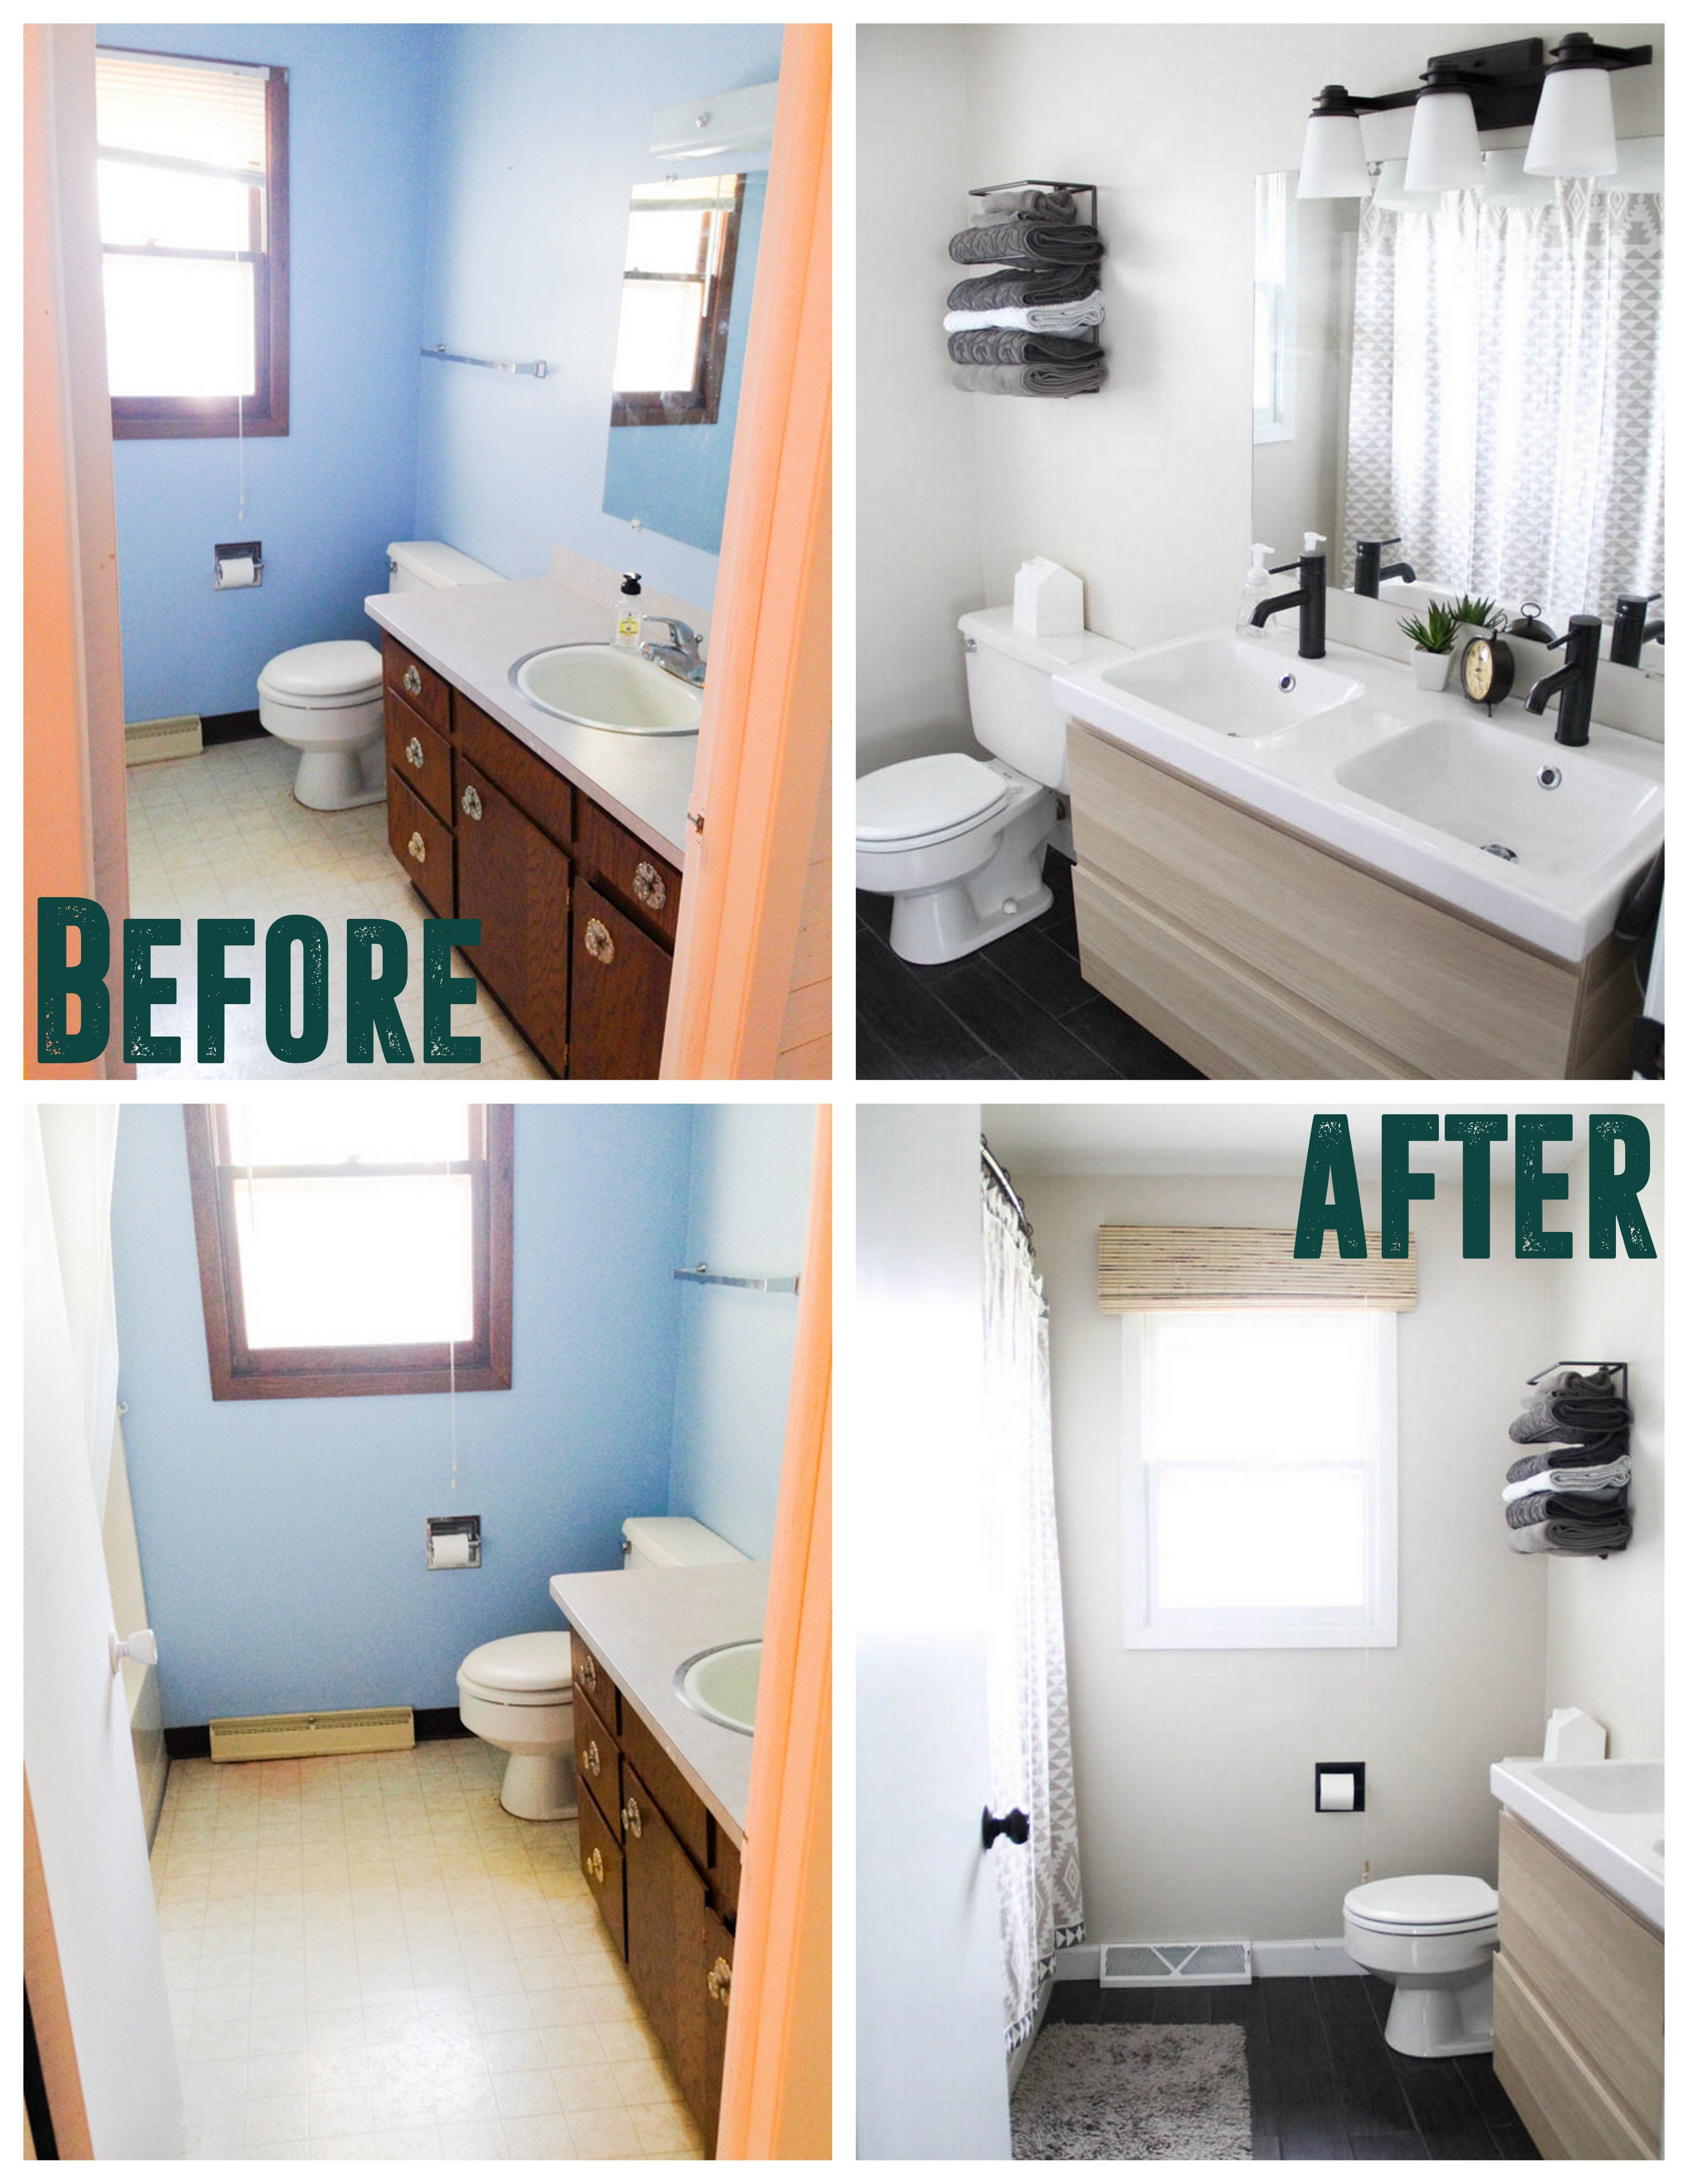 Affordable Modern Bathroom Reveal Modern Bathroom Remodel Inexpensive Bathroom Remodel Budget Bathroom Remodel